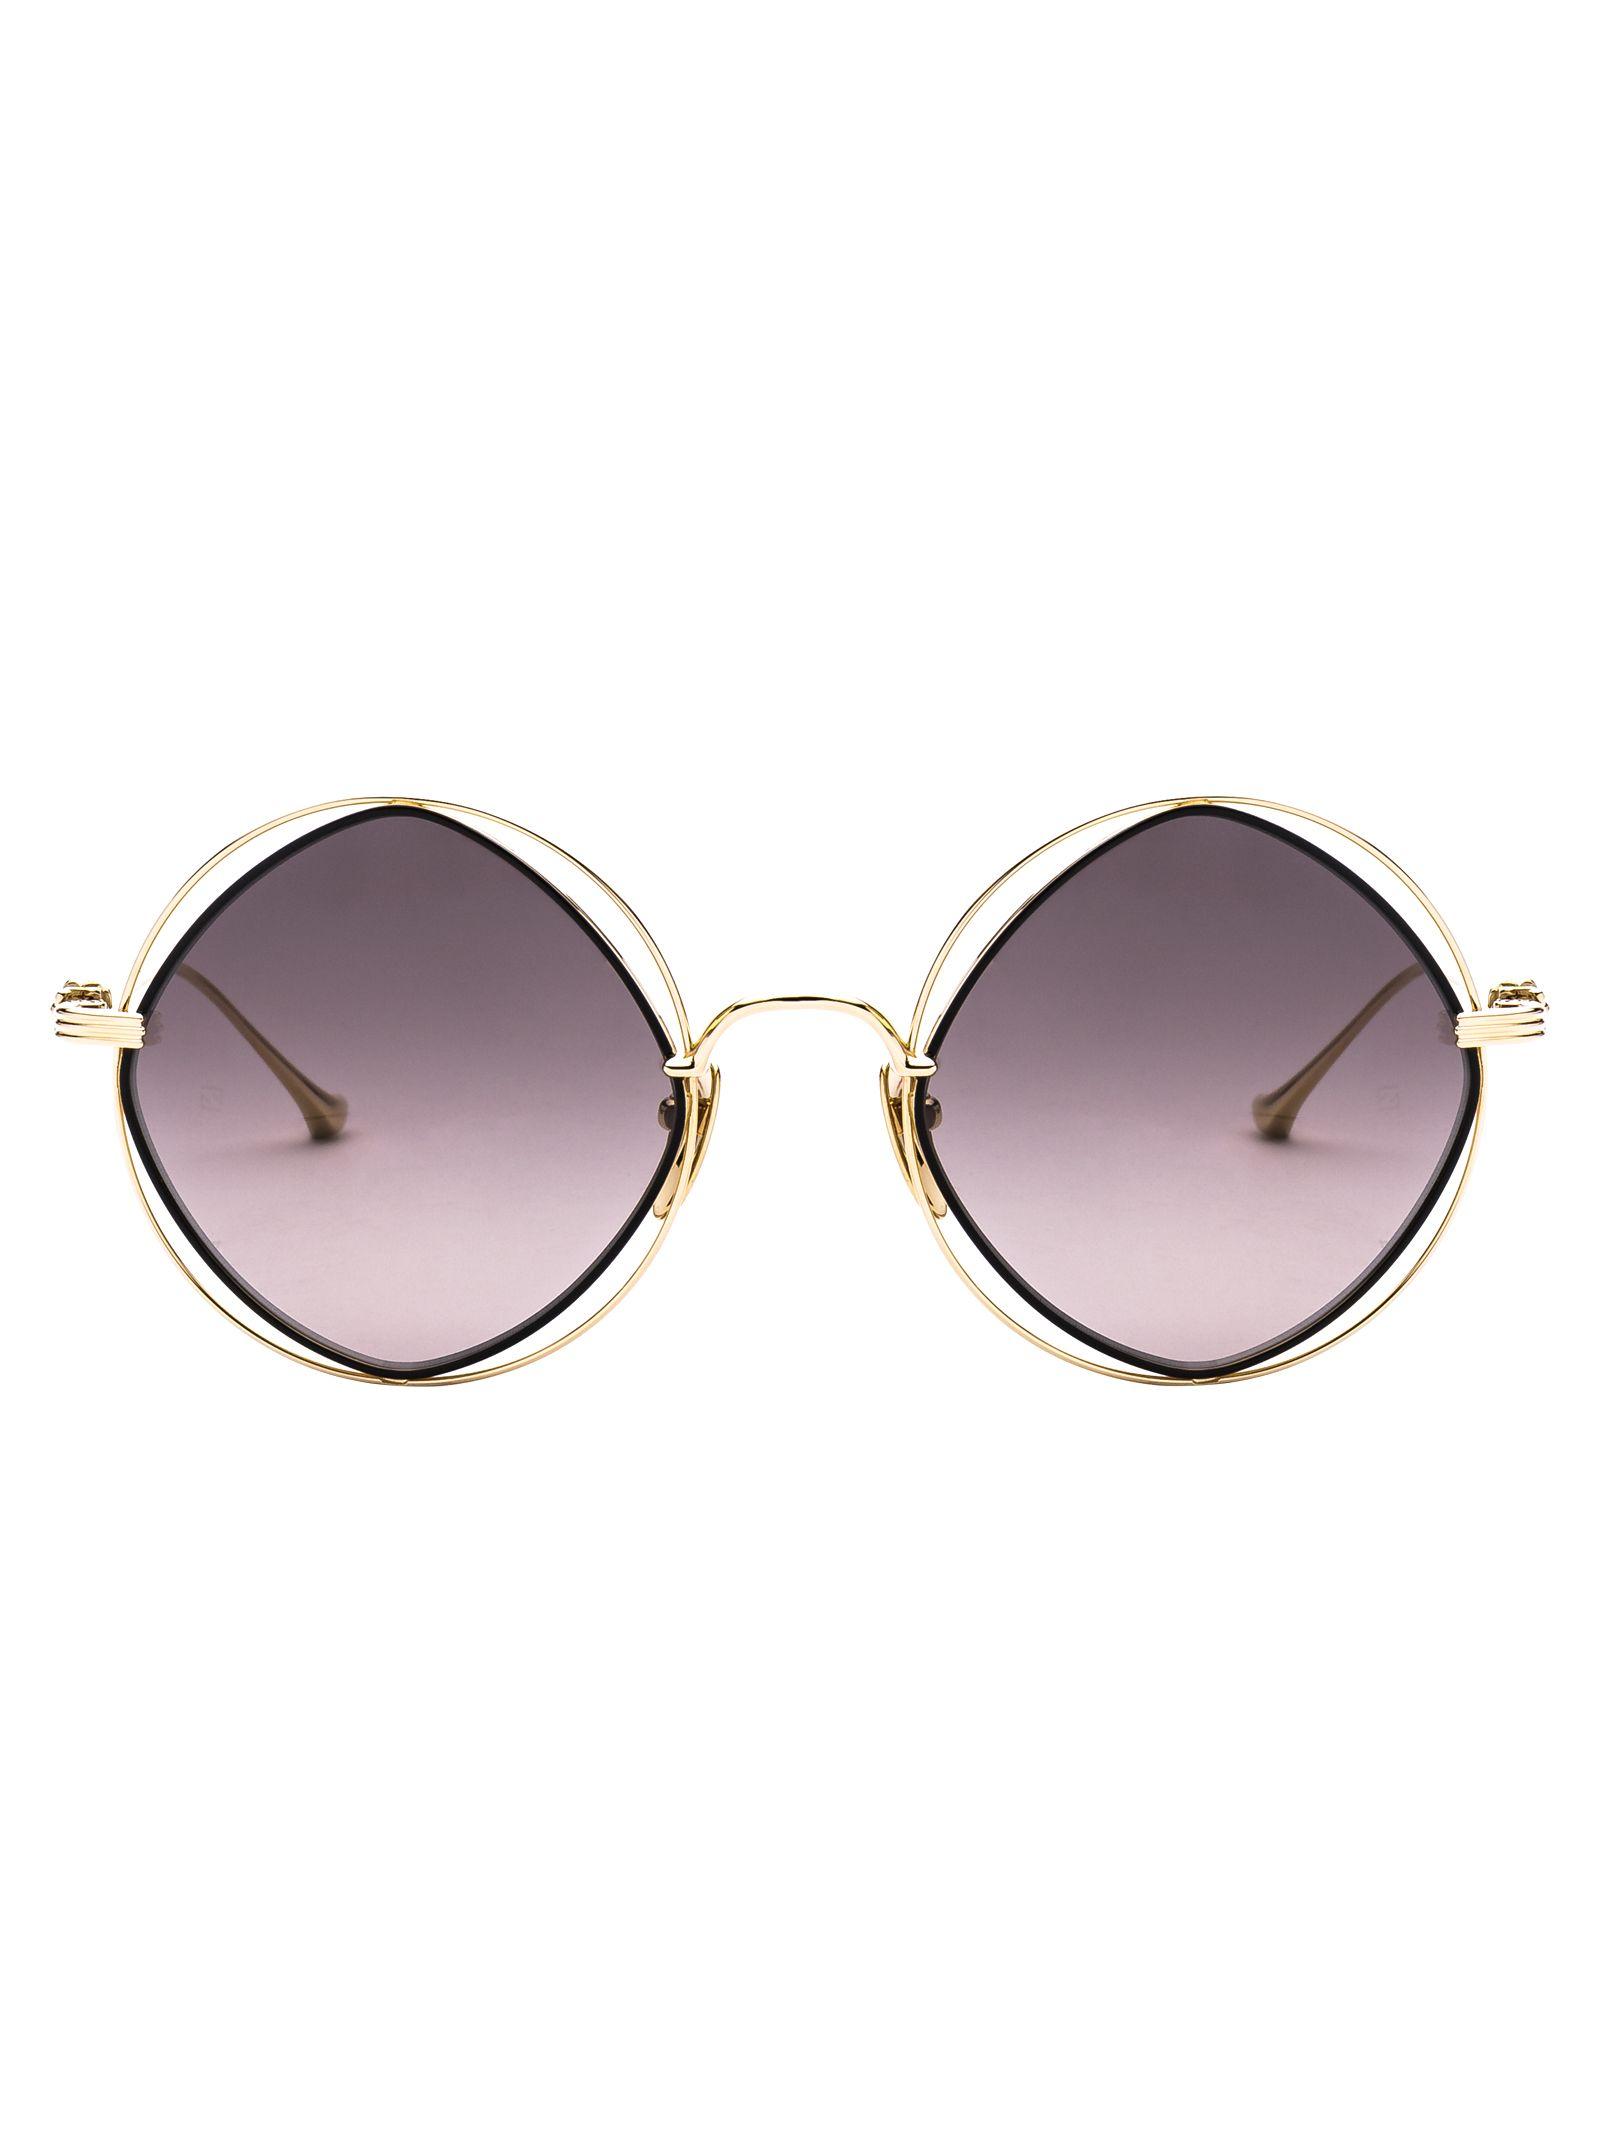 CHROME HEARTS Semenstress Sunglasses in Mbkgp